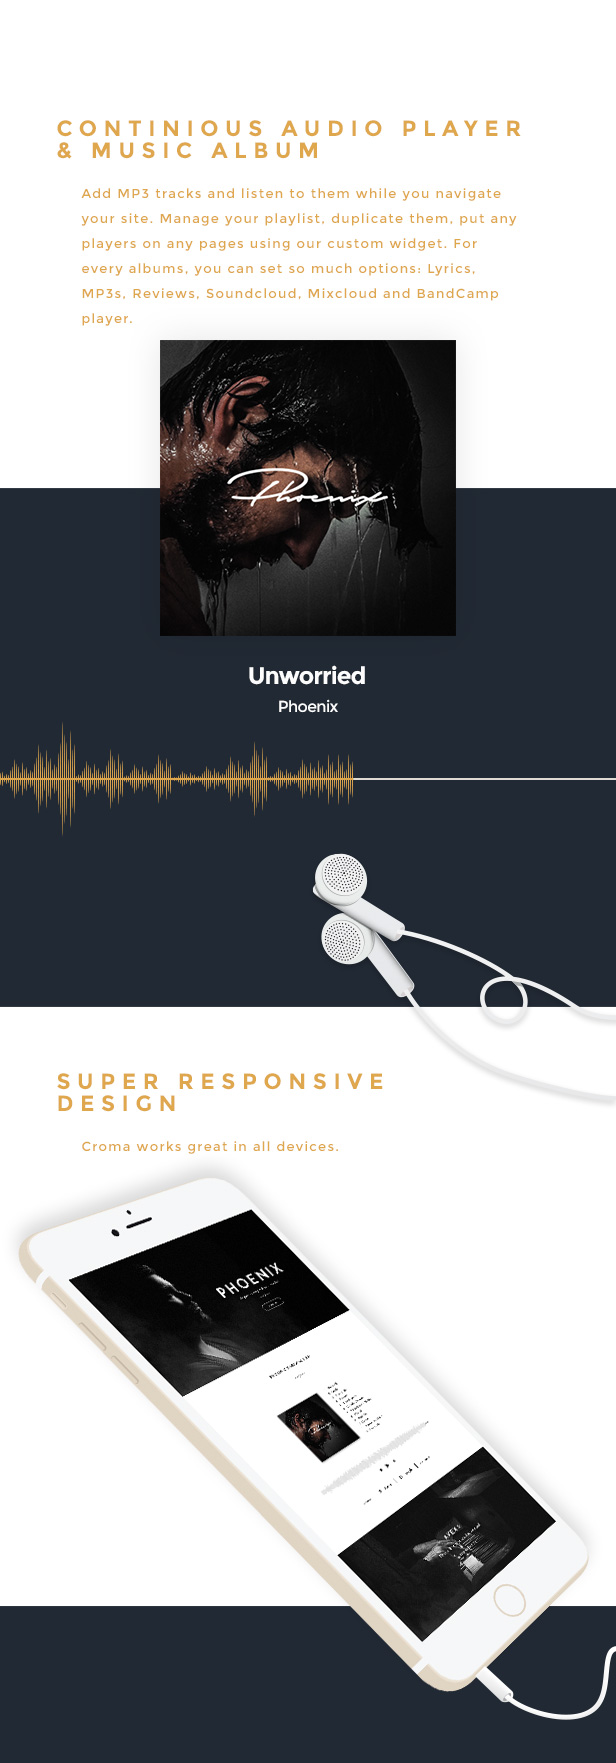 Croma - سمة WordPress للموسيقى المستجيبة